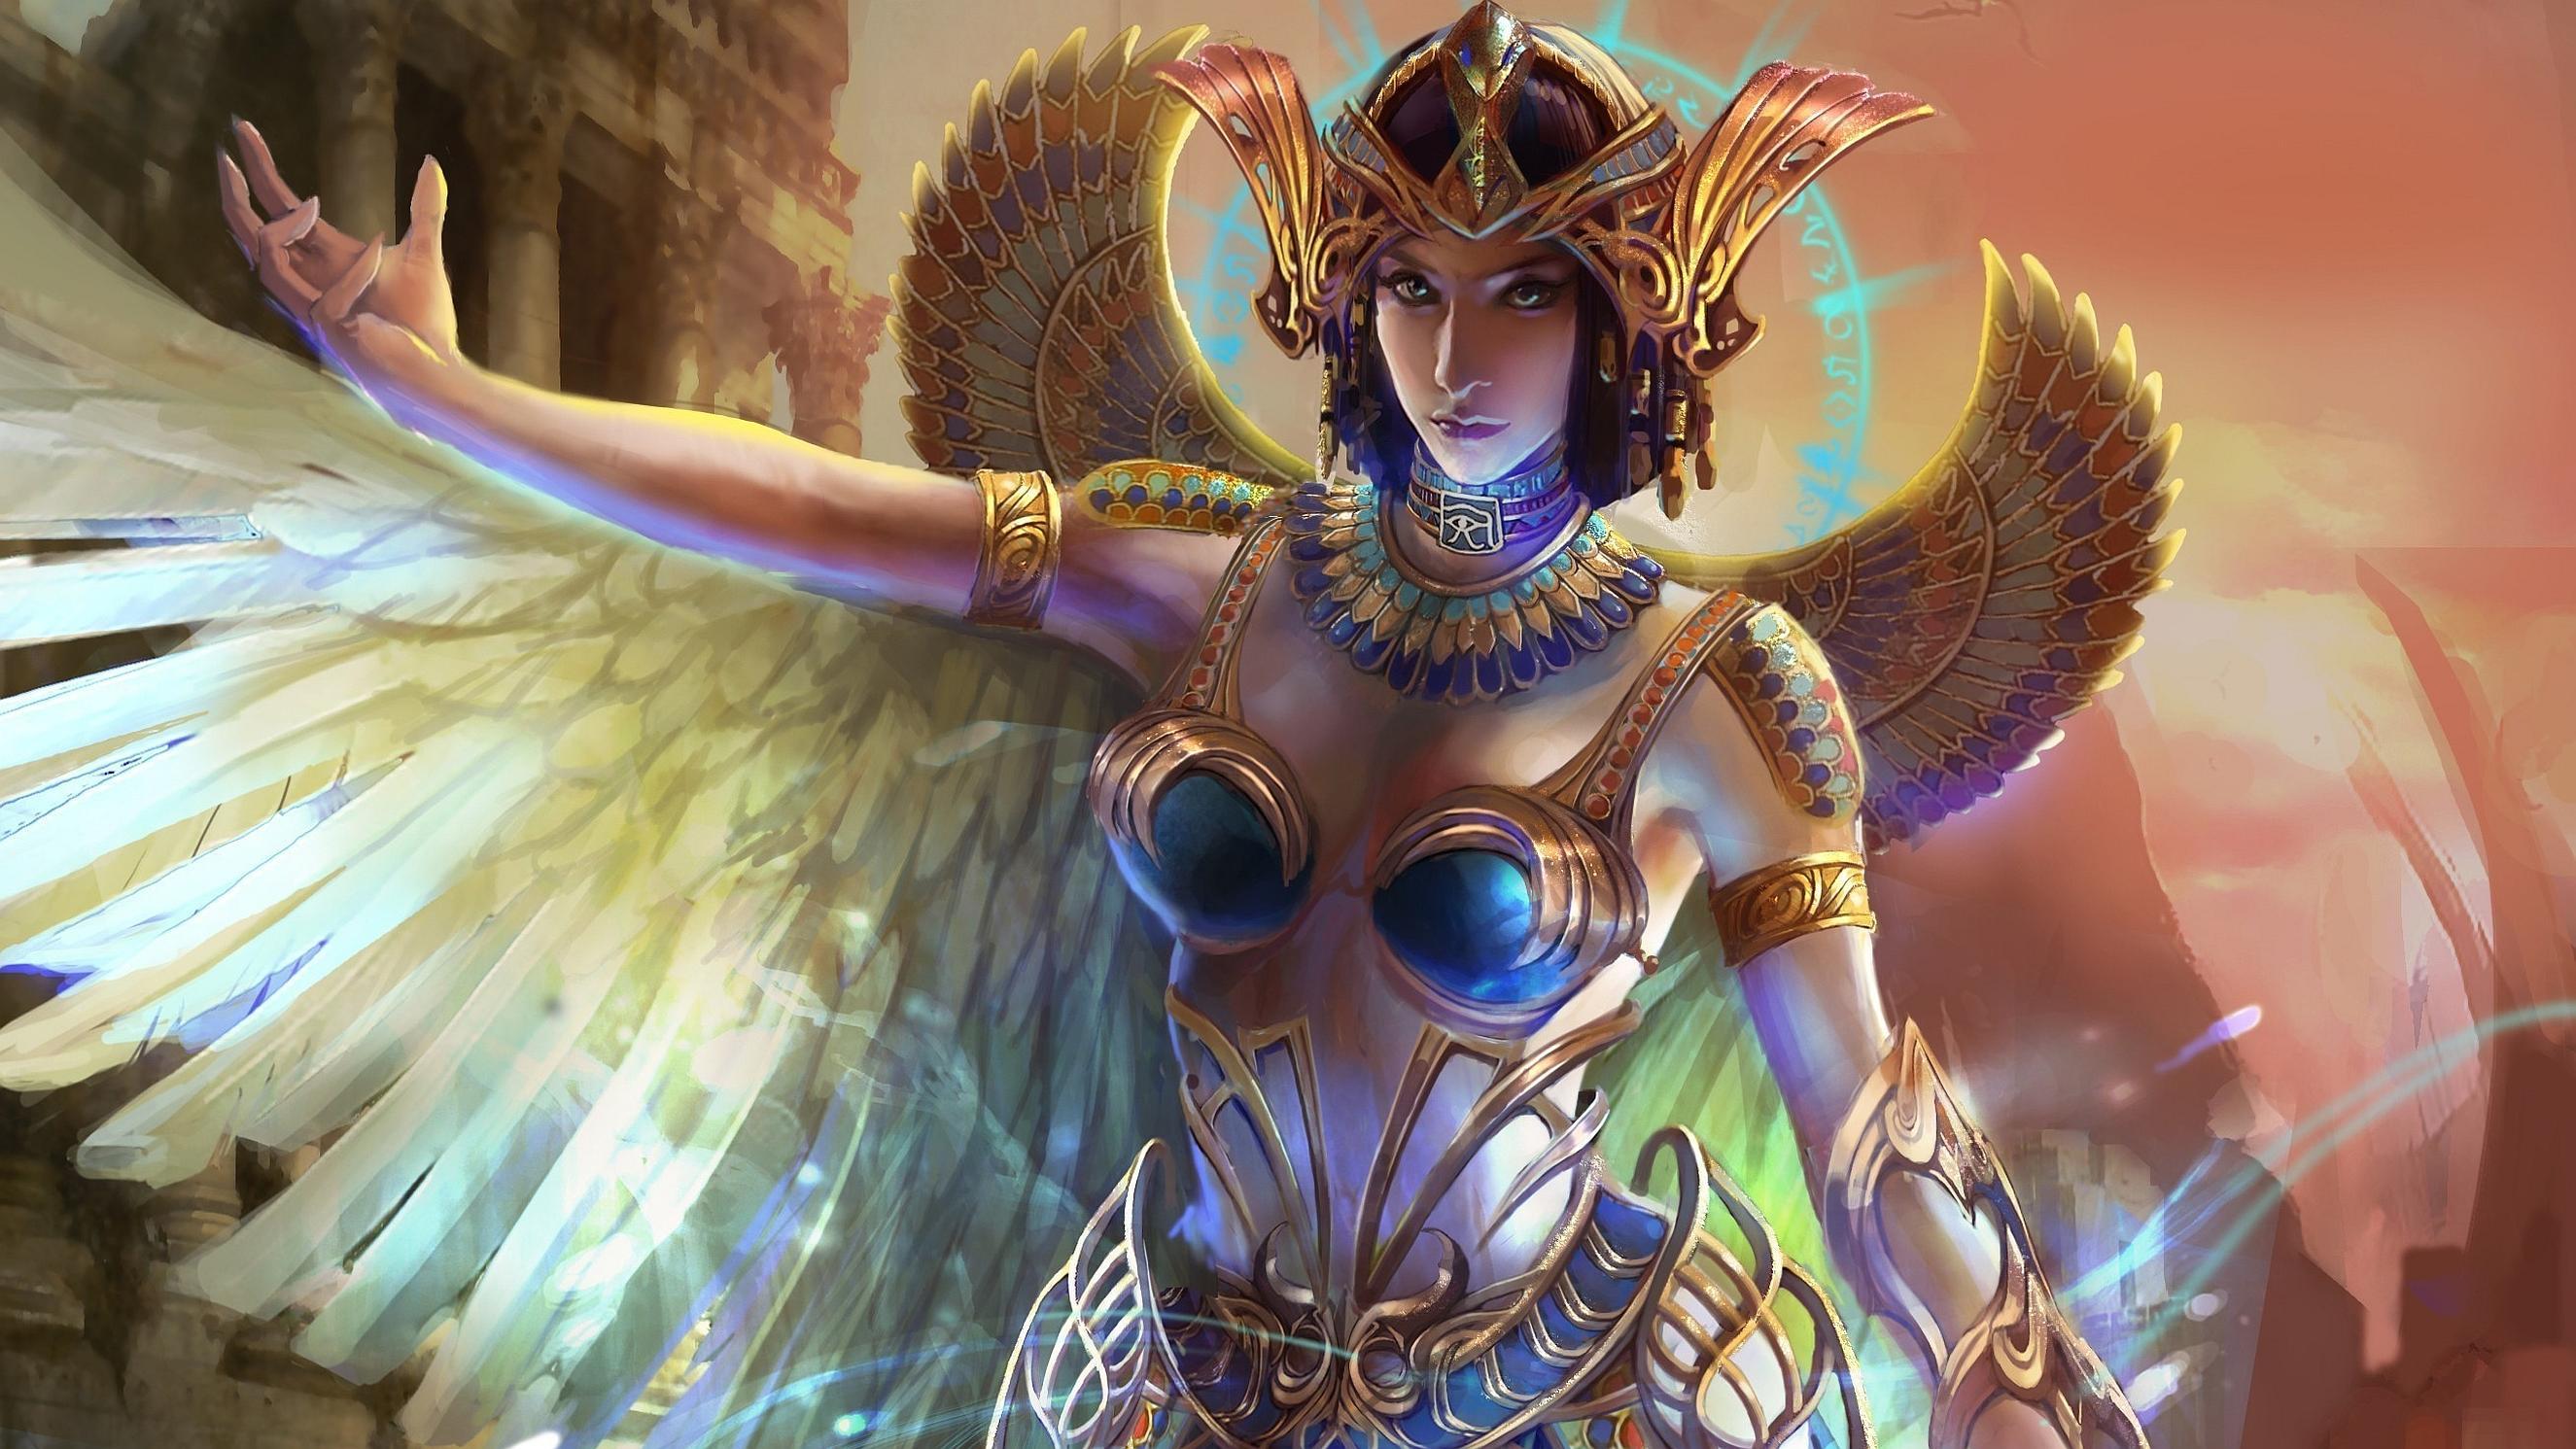 Beautiful Girl Wallpaper Hd Download Brilliant Angel Art Christian Fantasy Hd Wallpaper 1860976